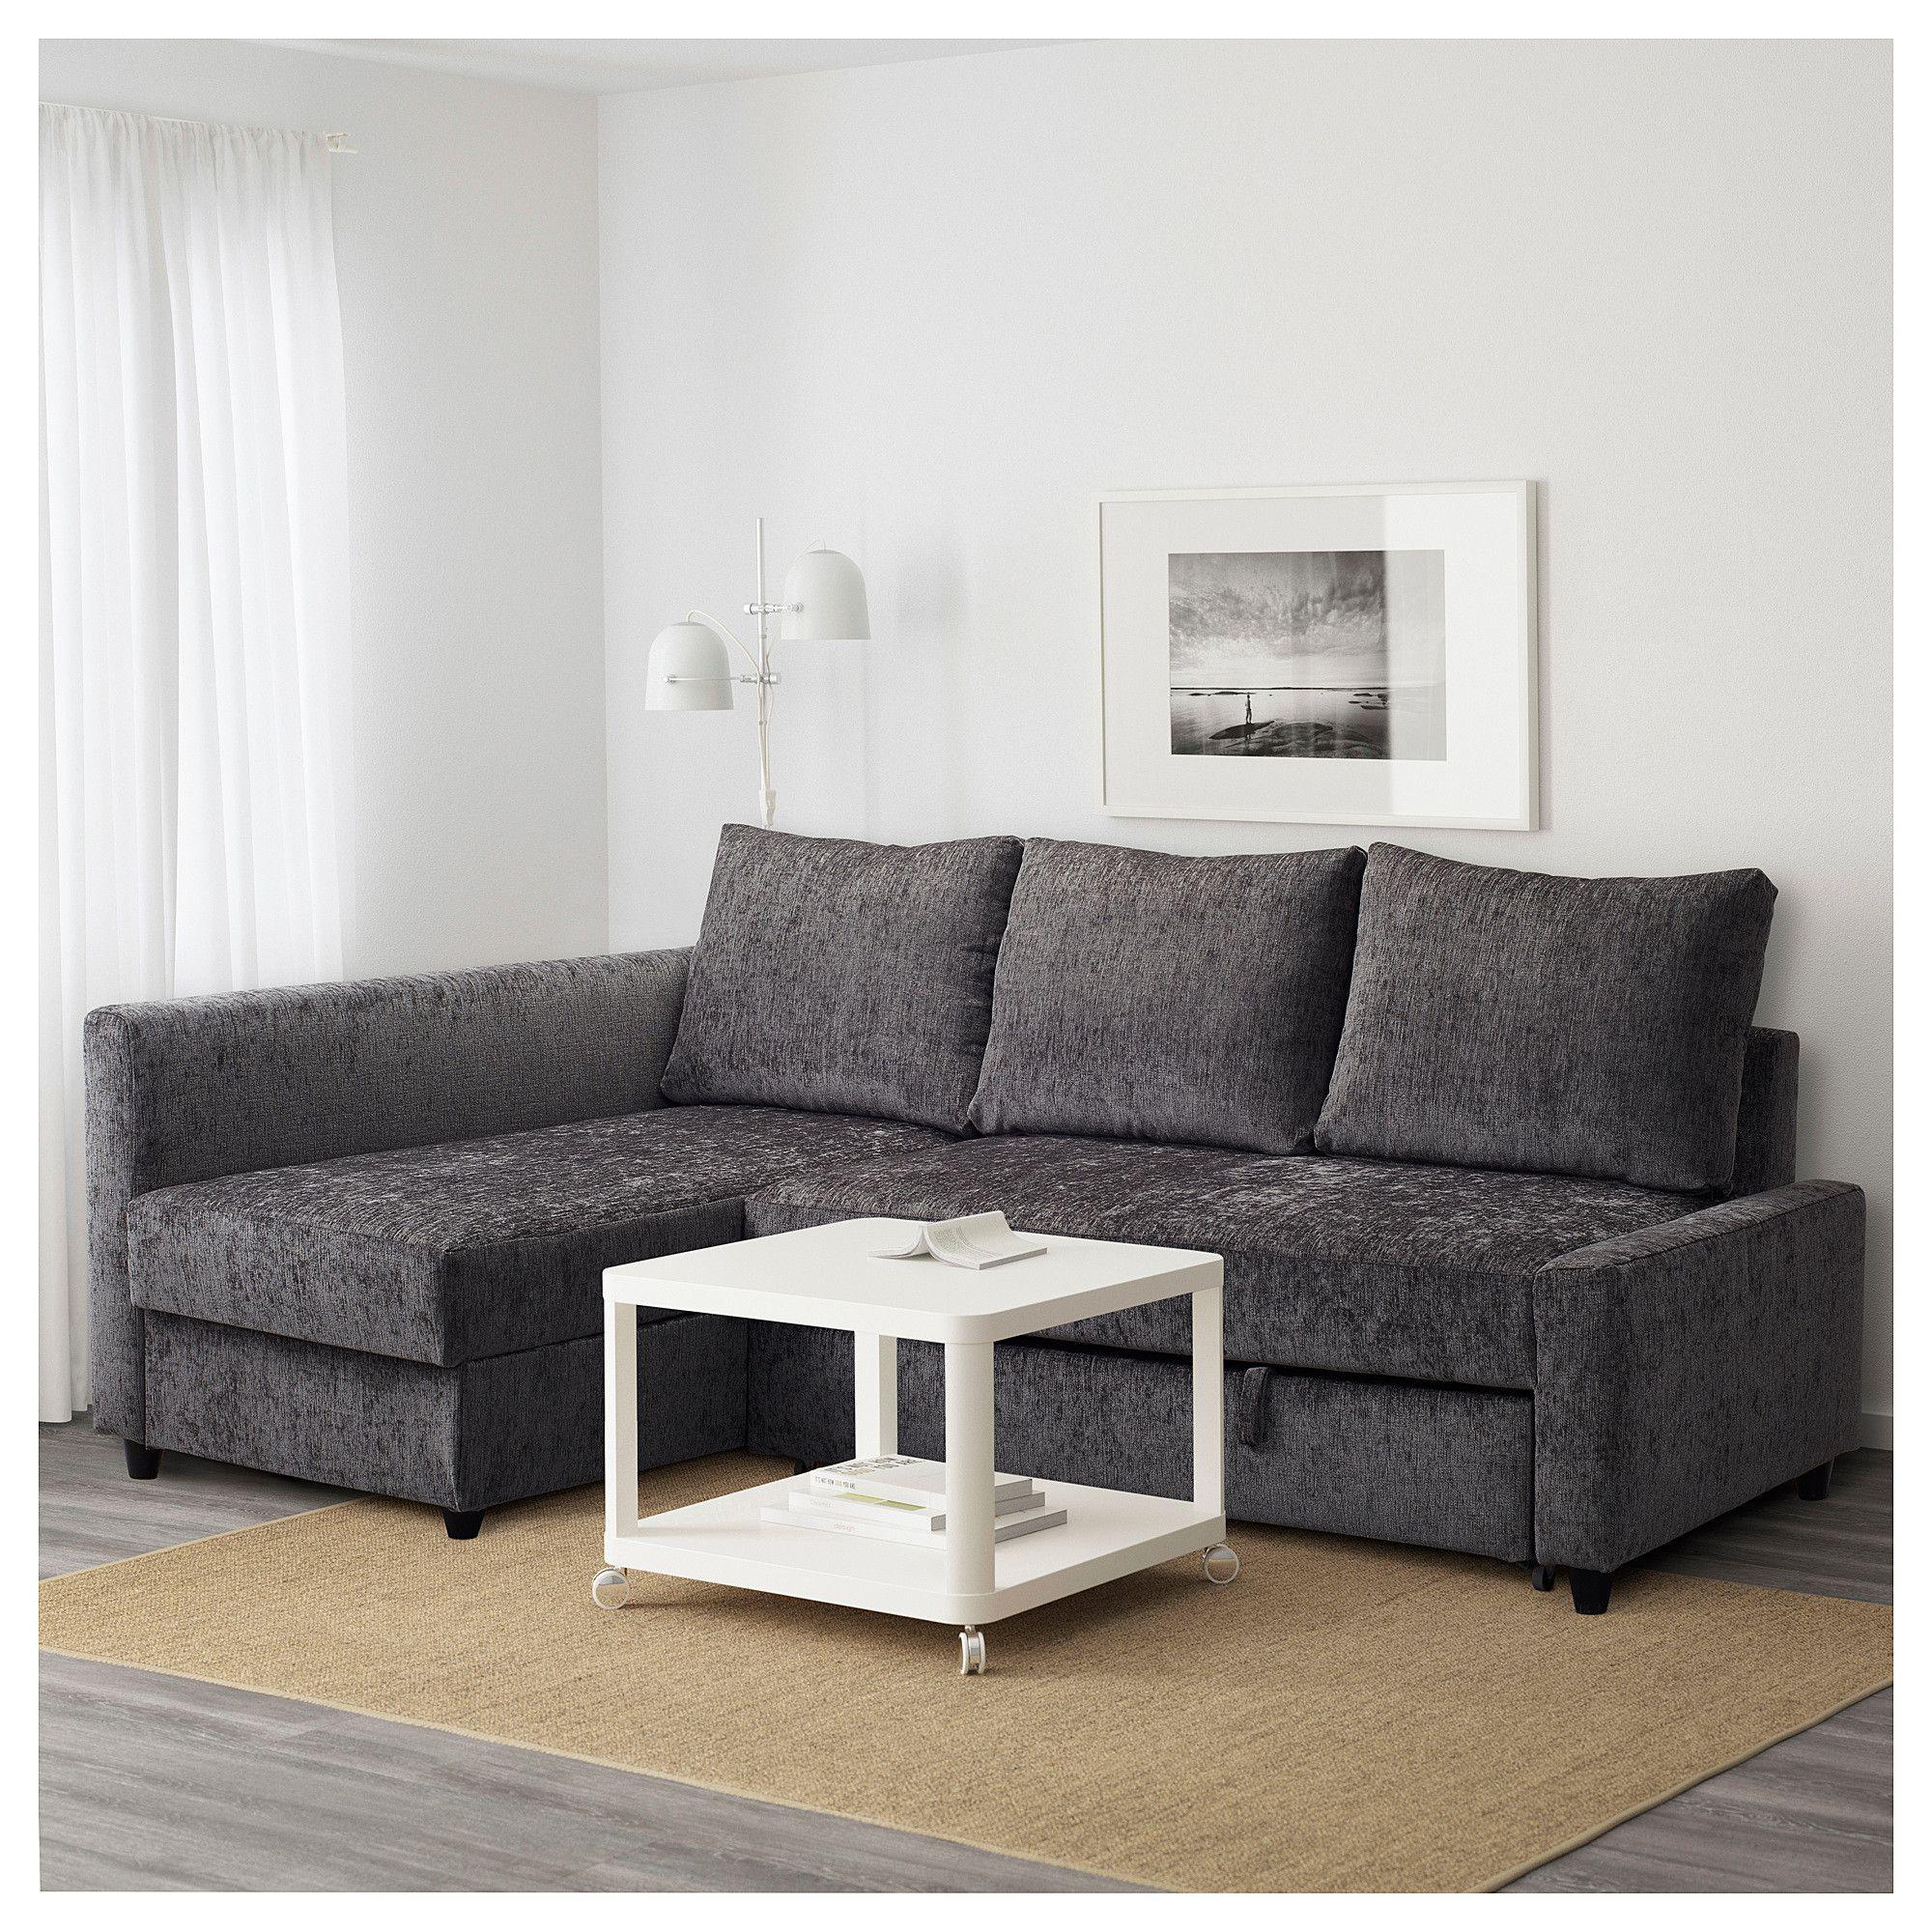 25 Luxus Mikrofaser Sofa Cover Ikea ecksofa, Bettsofa